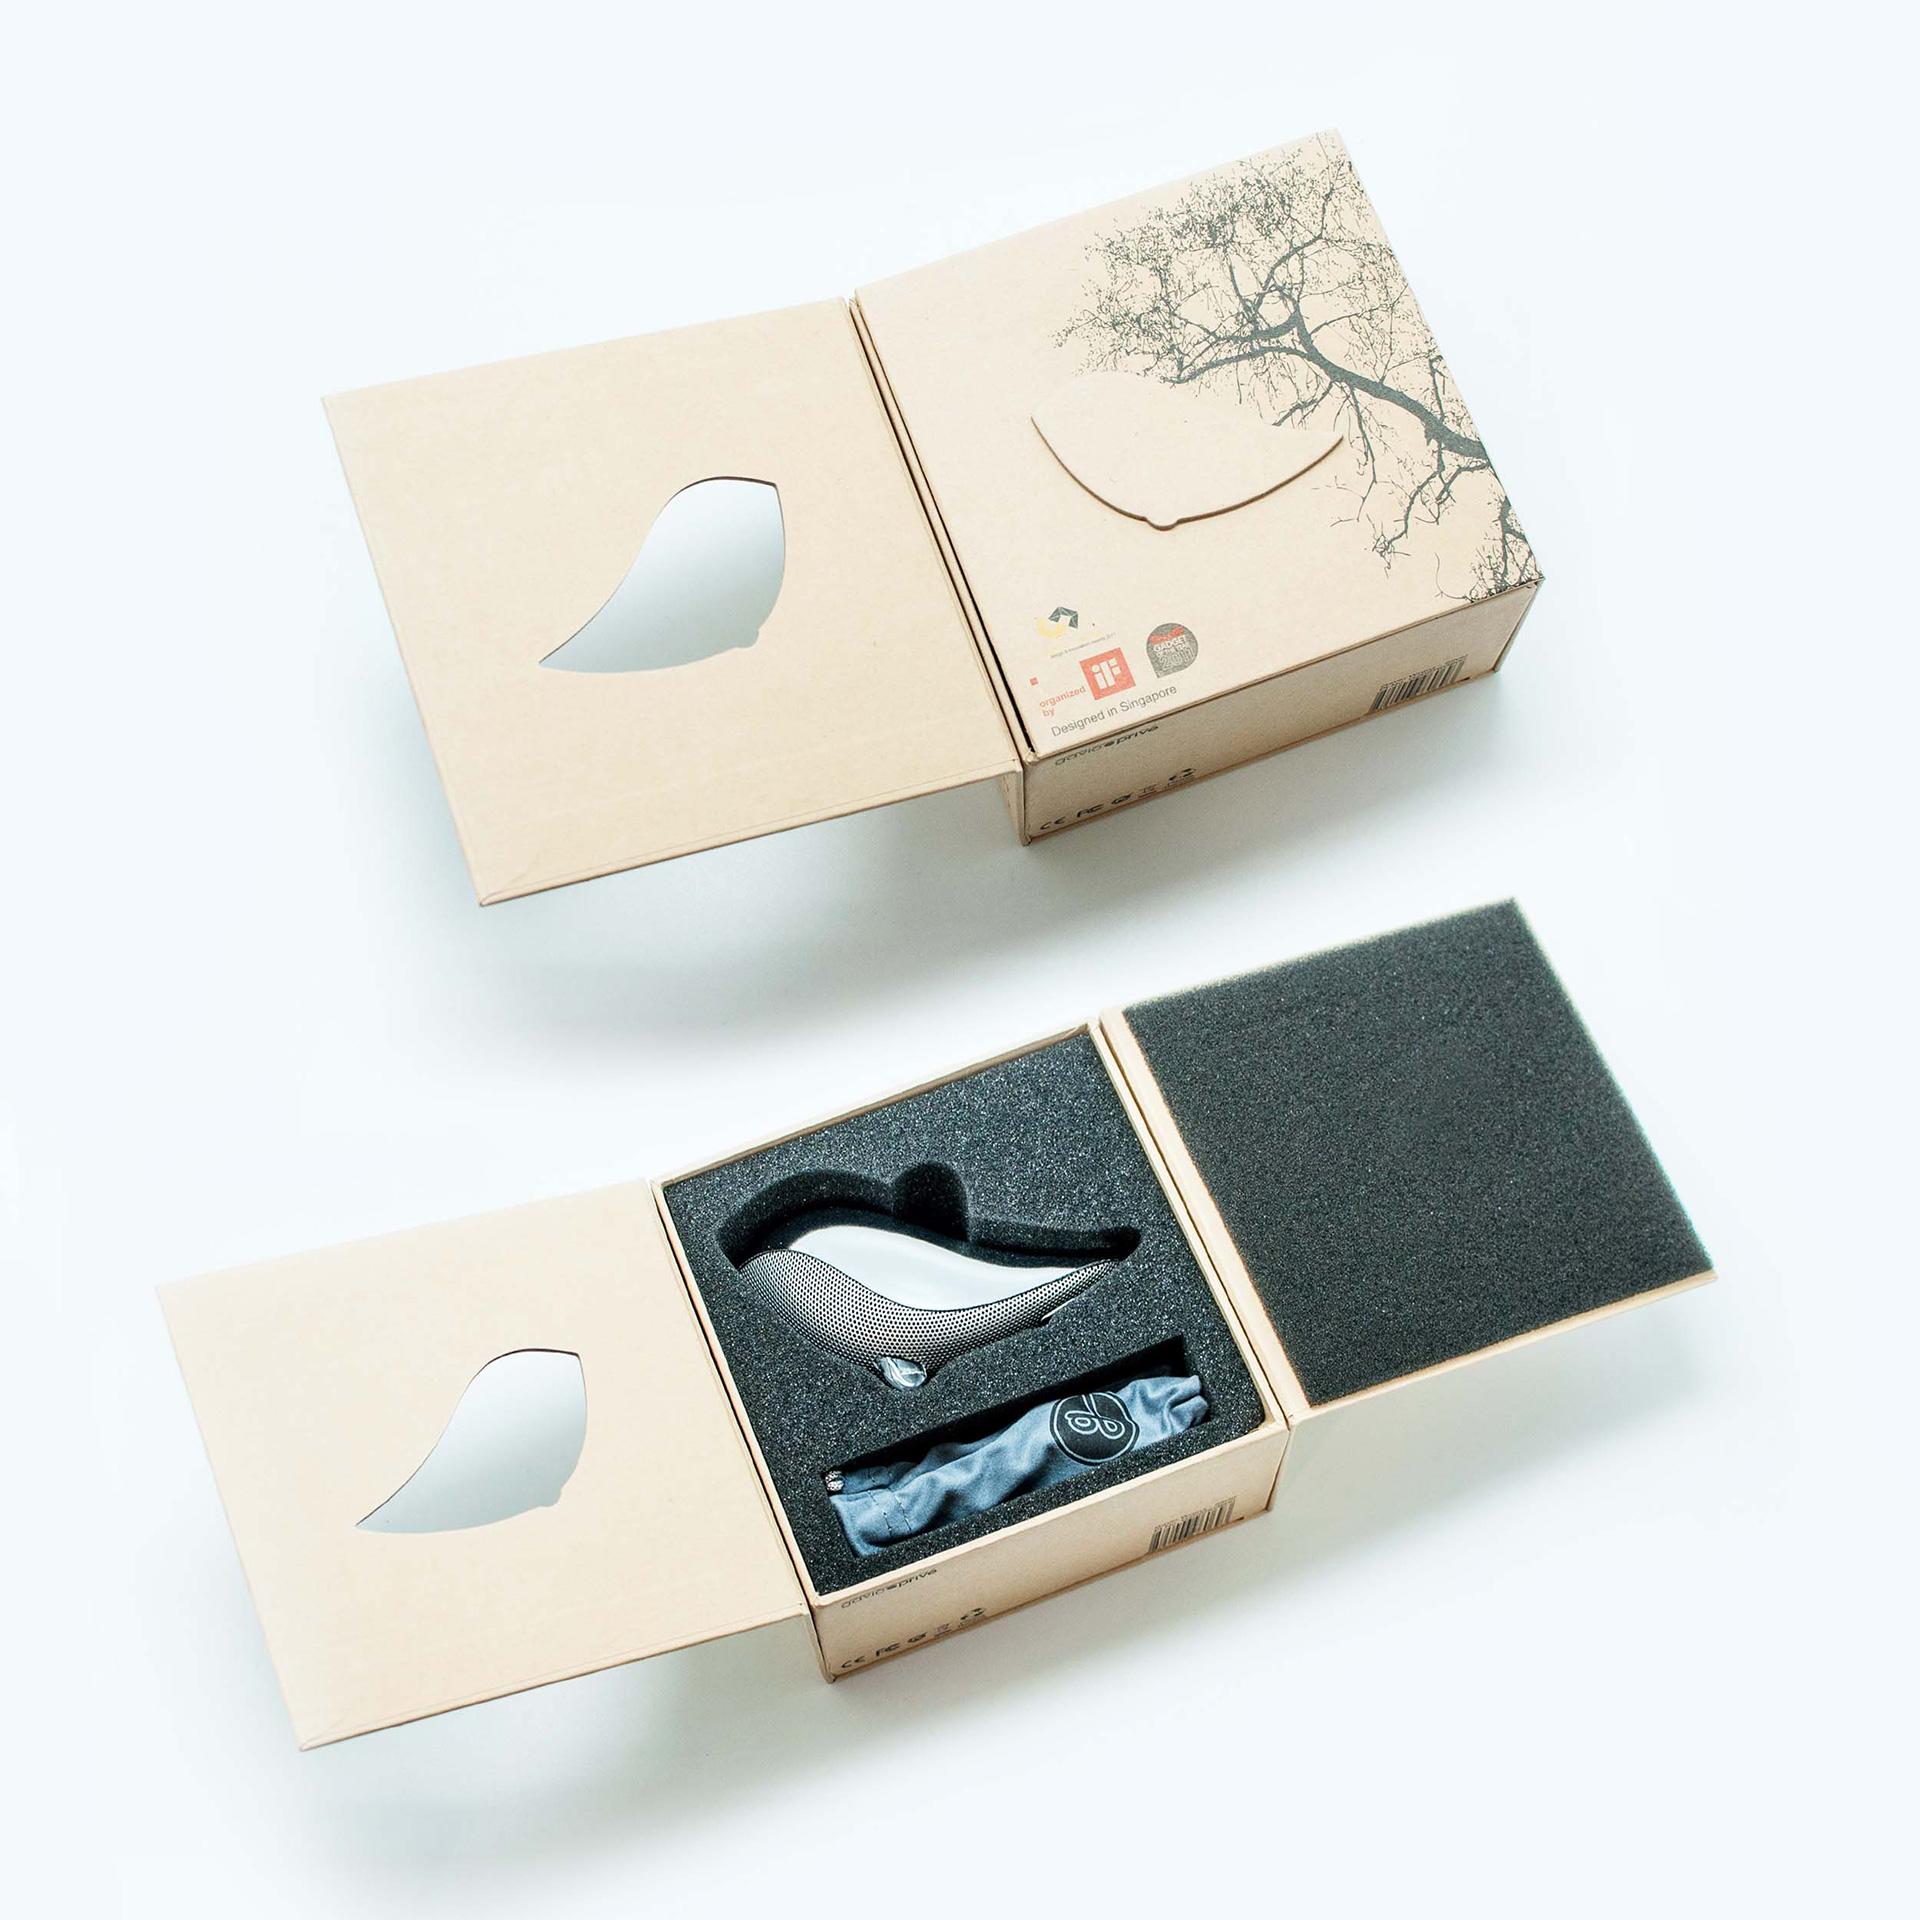 Wrenz Portable Speaker Packaging - PaperSpecs